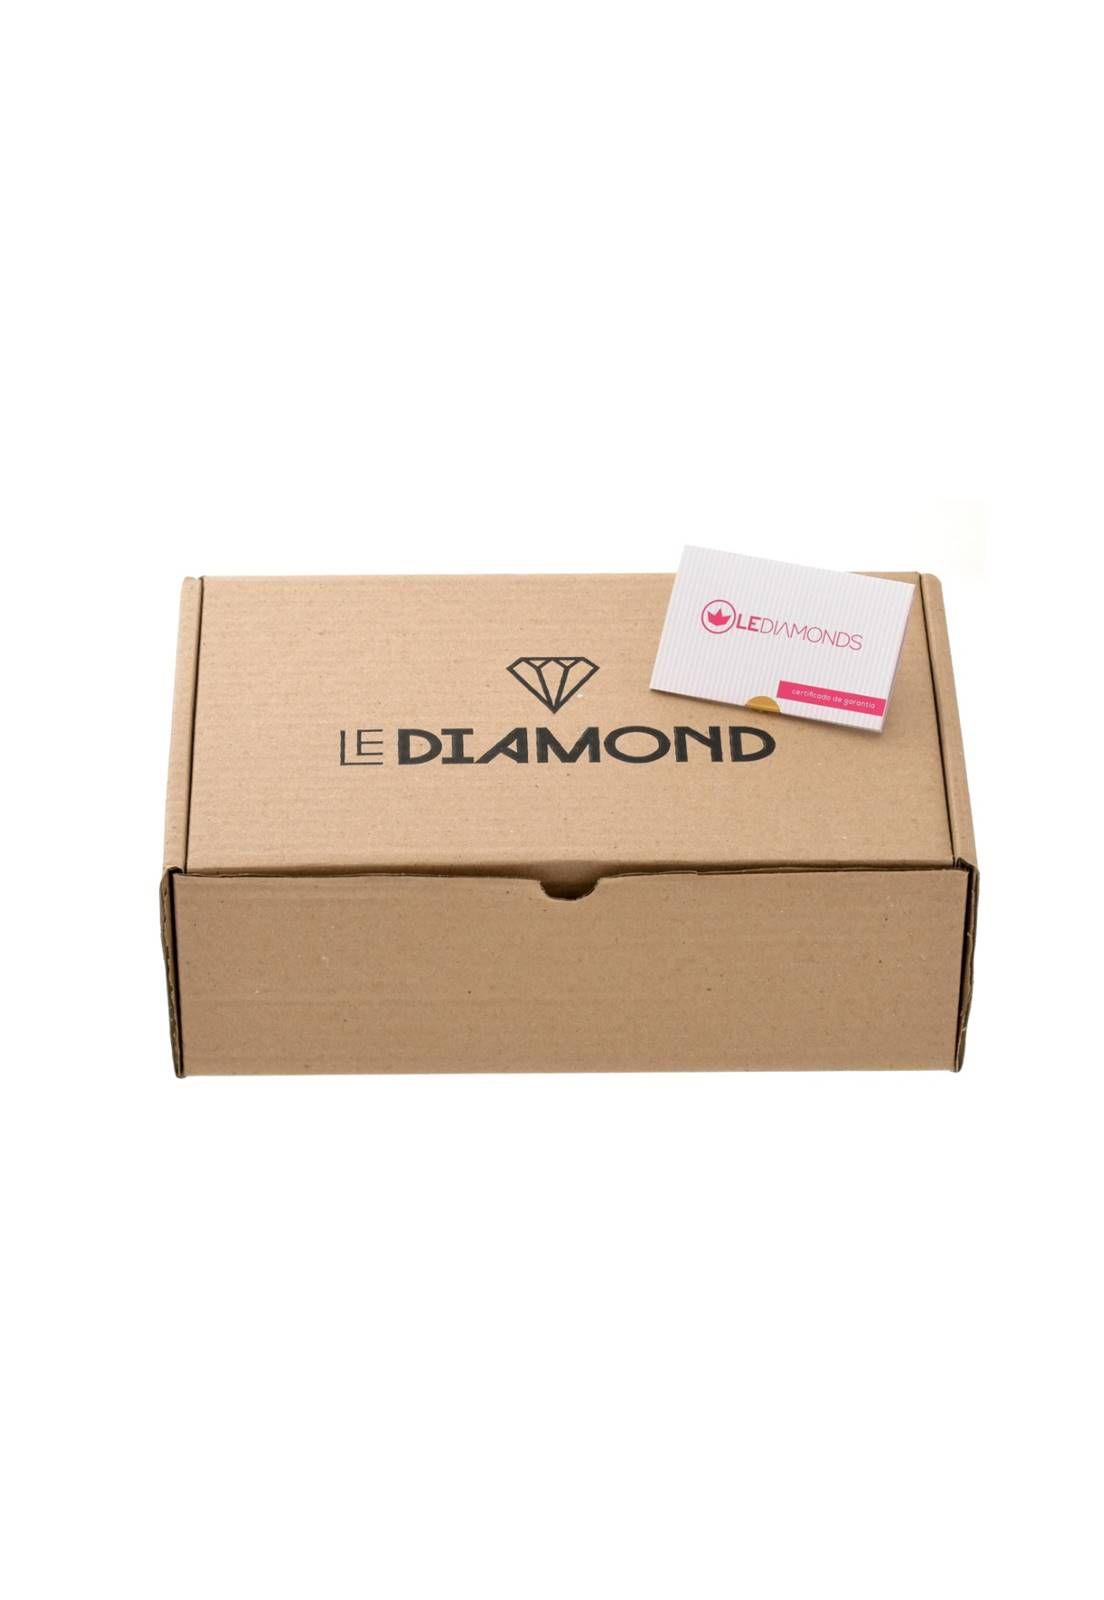 Brinco Le Diamond Carminha Crochê Marrom